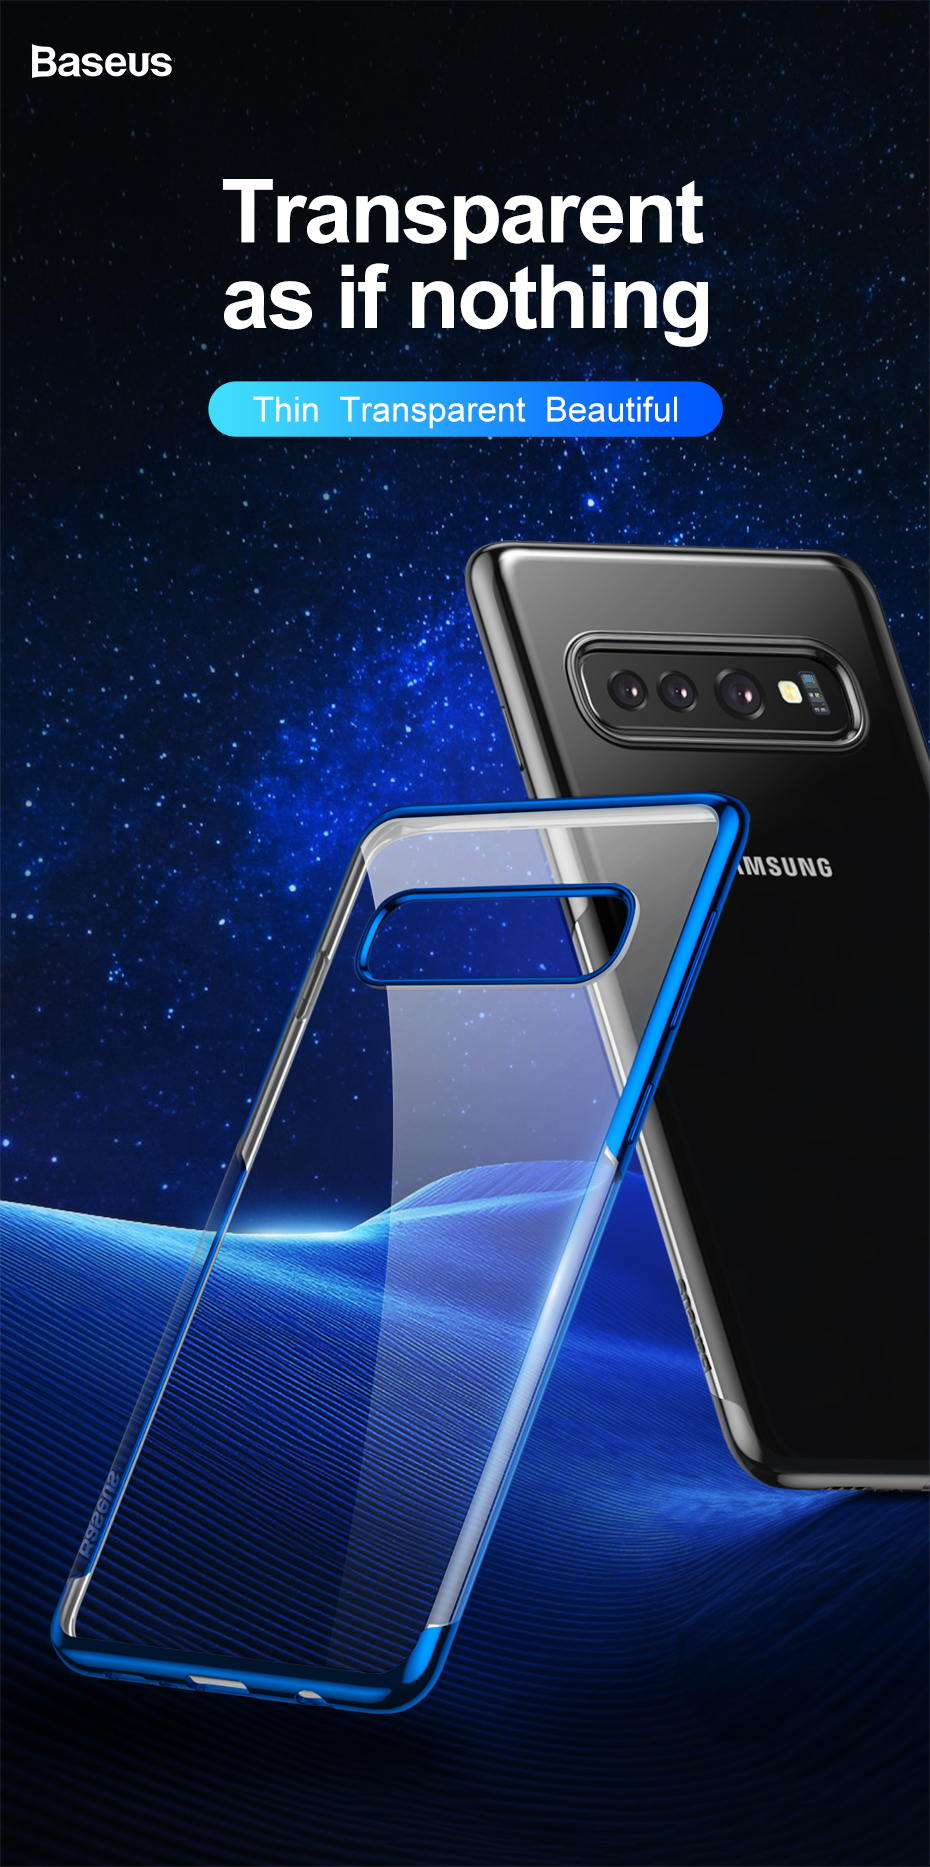 baseus luxury phone case for samsung s10 s10 plus